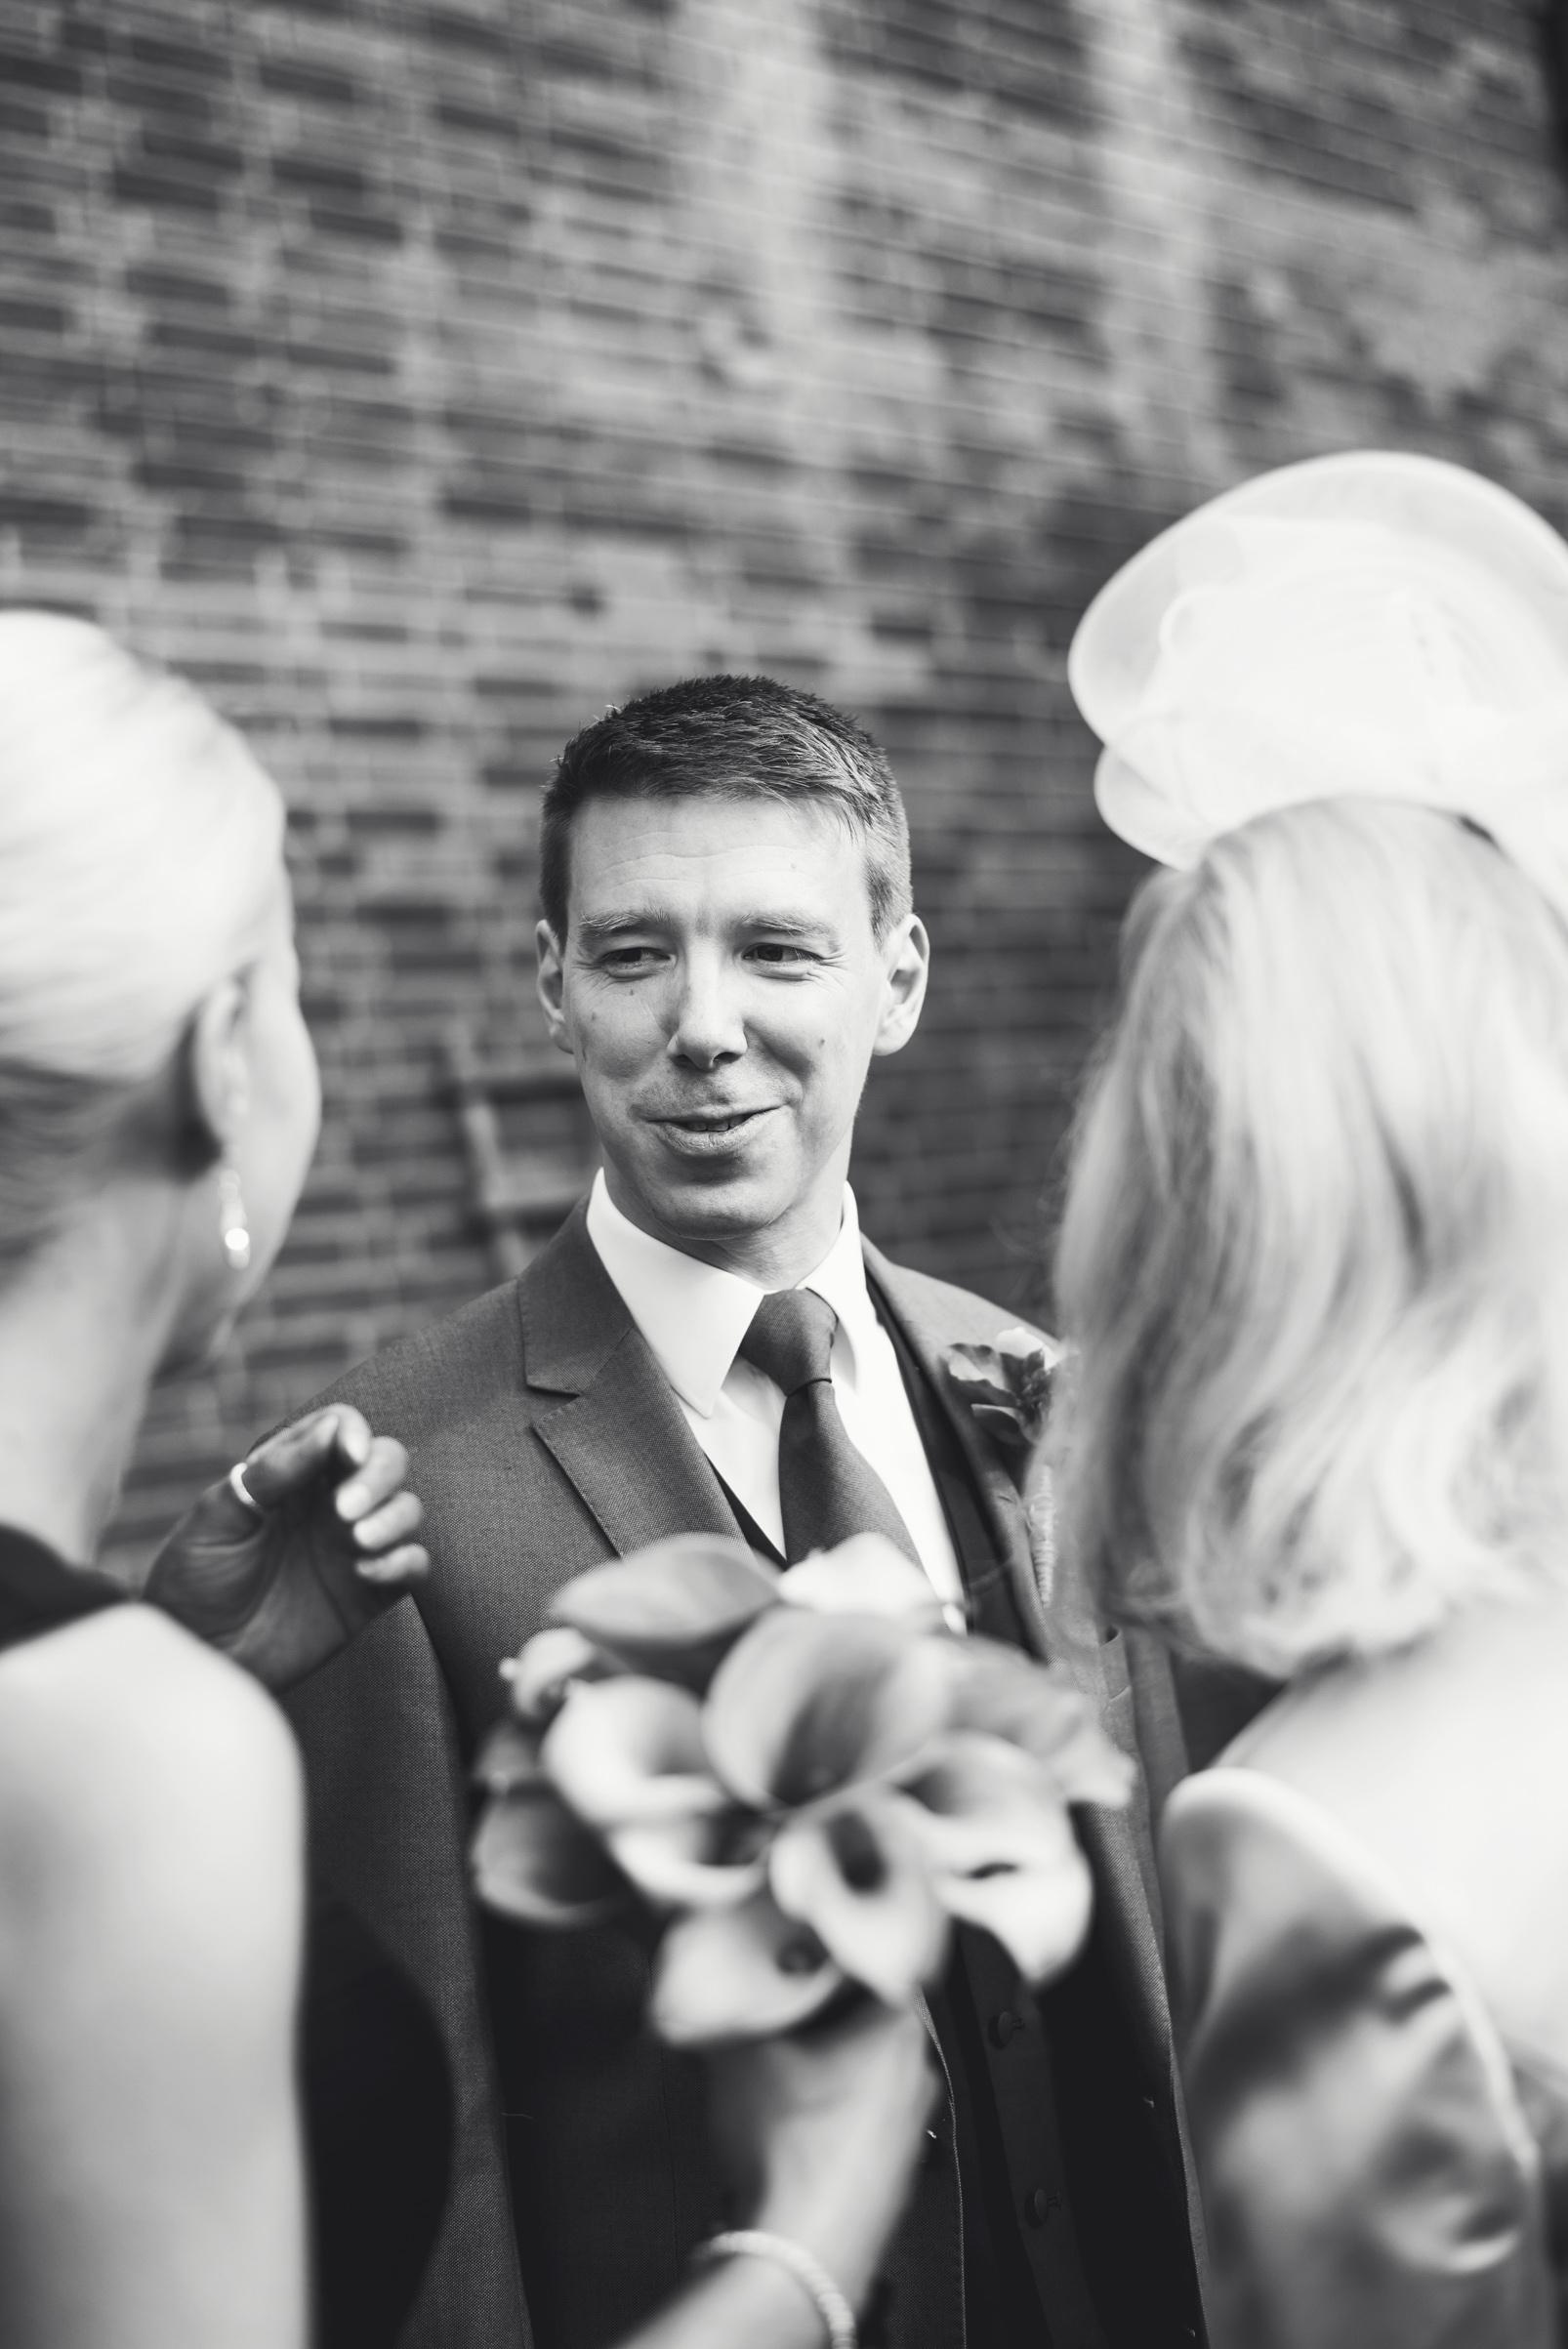 The+Fairlawns+wedding+Aldridge+StLukes+Church-114.jpg